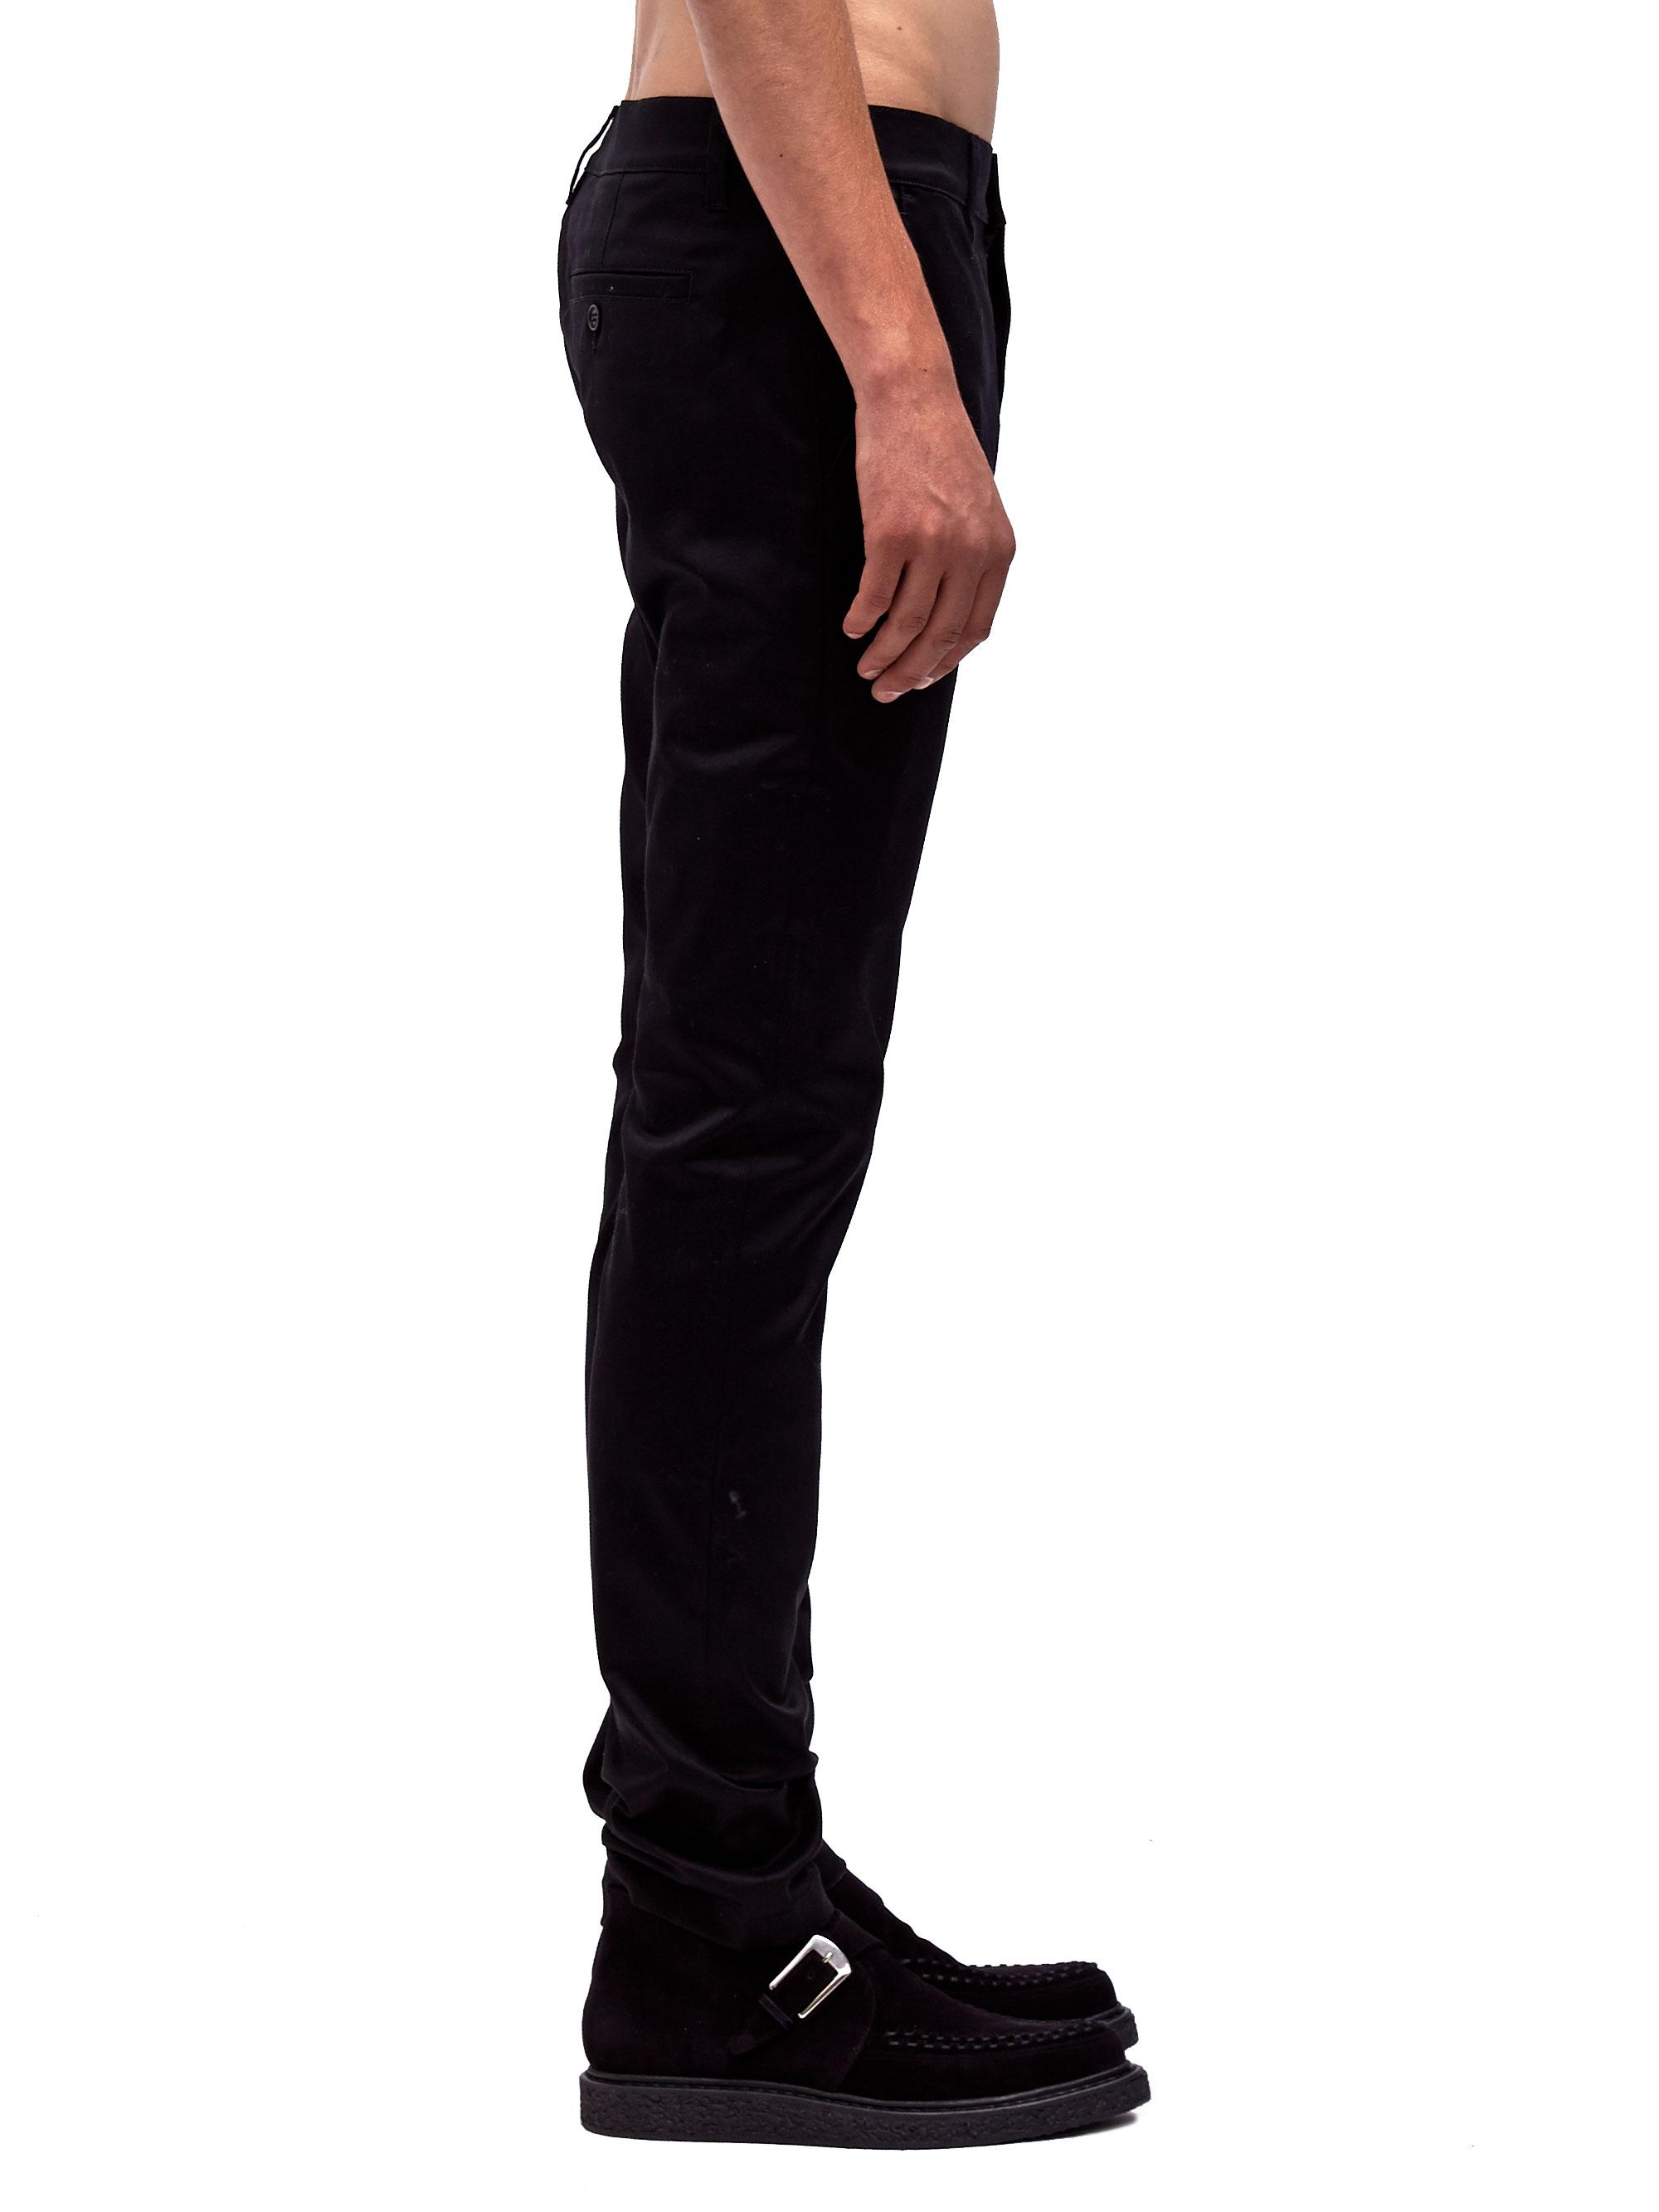 445cdf06e380e6 Saint Laurent Mens Slim Fit Chino Pants in Black for Men - Lyst